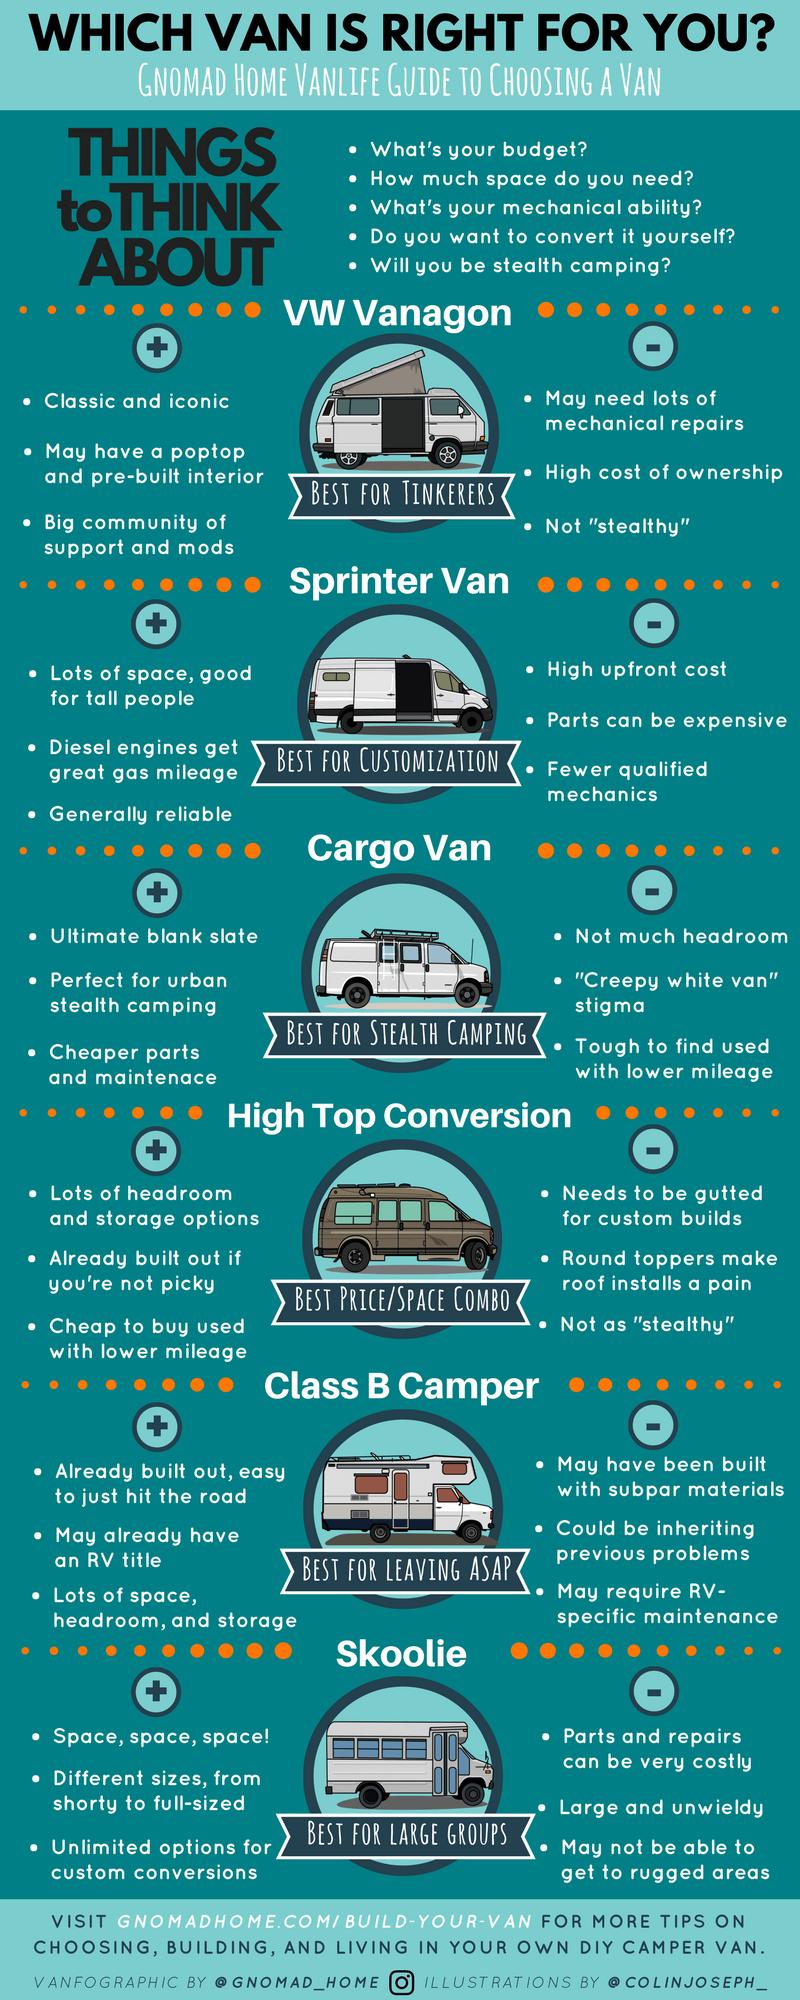 Build Your Van: The Ultimate Van Build Guide for Vanlife